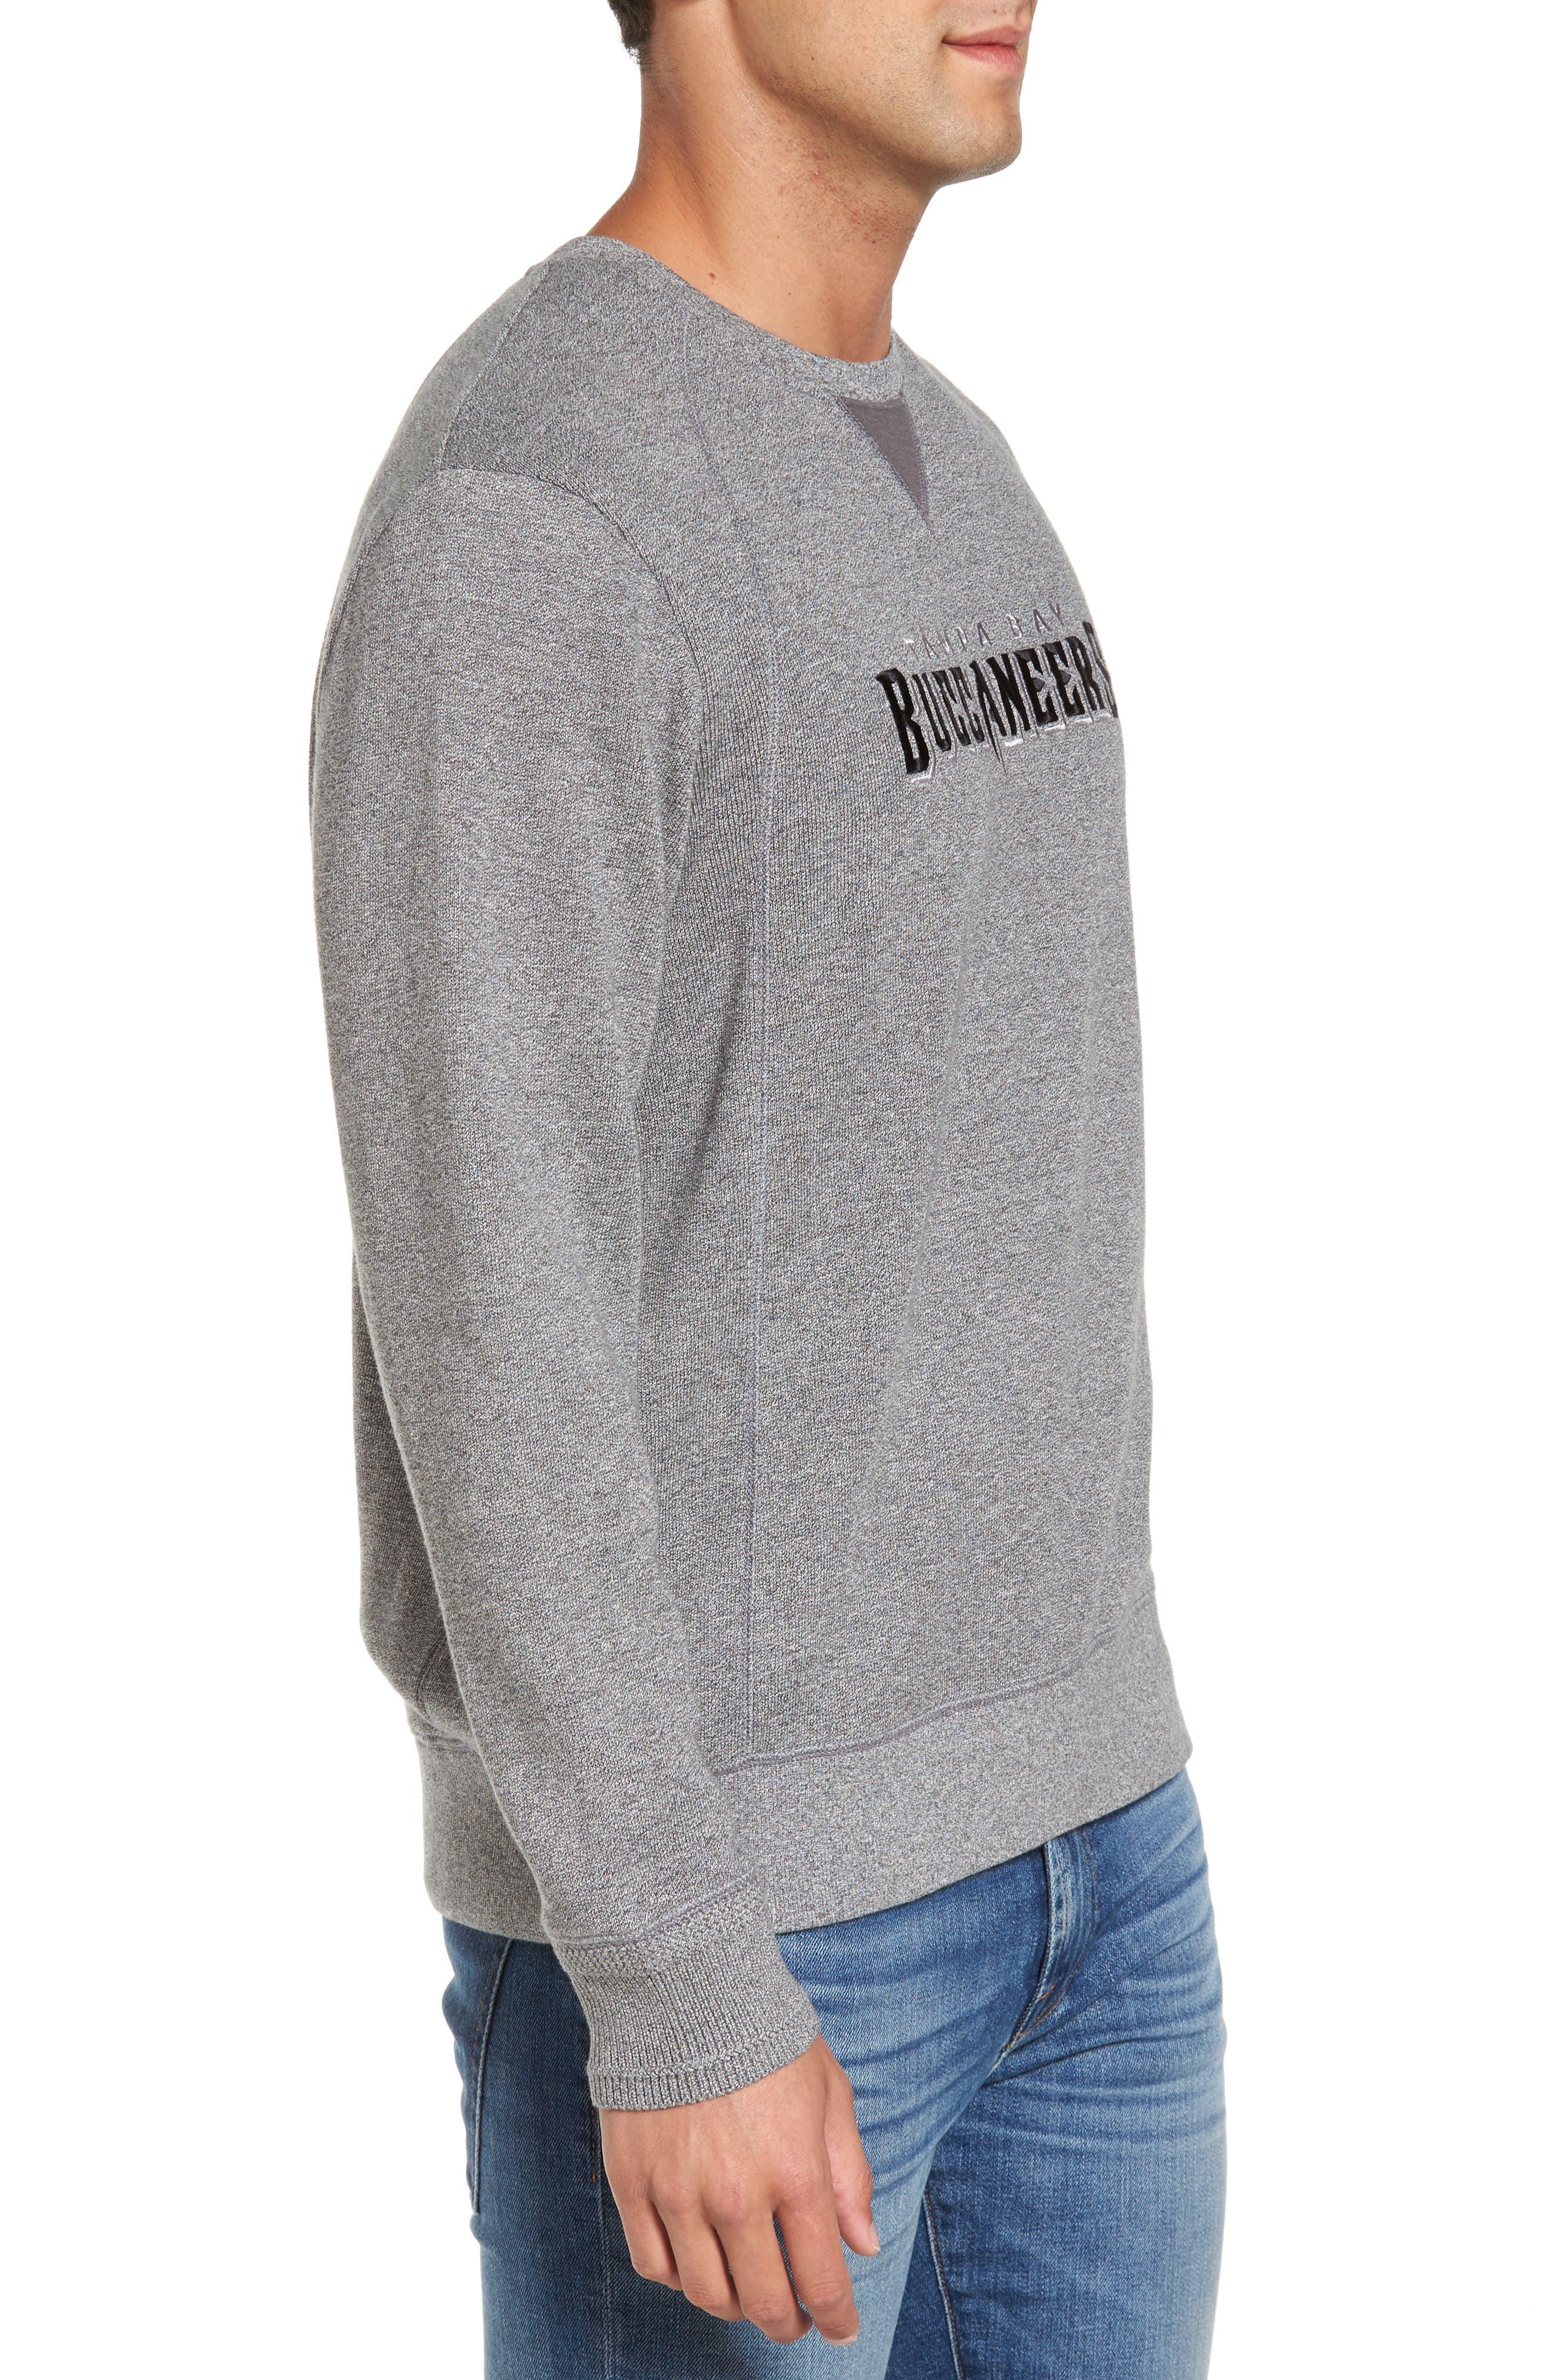 NFL Stitch of Liberty Embroidered Crewneck Sweatshirt,                             Alternate thumbnail 70, color,